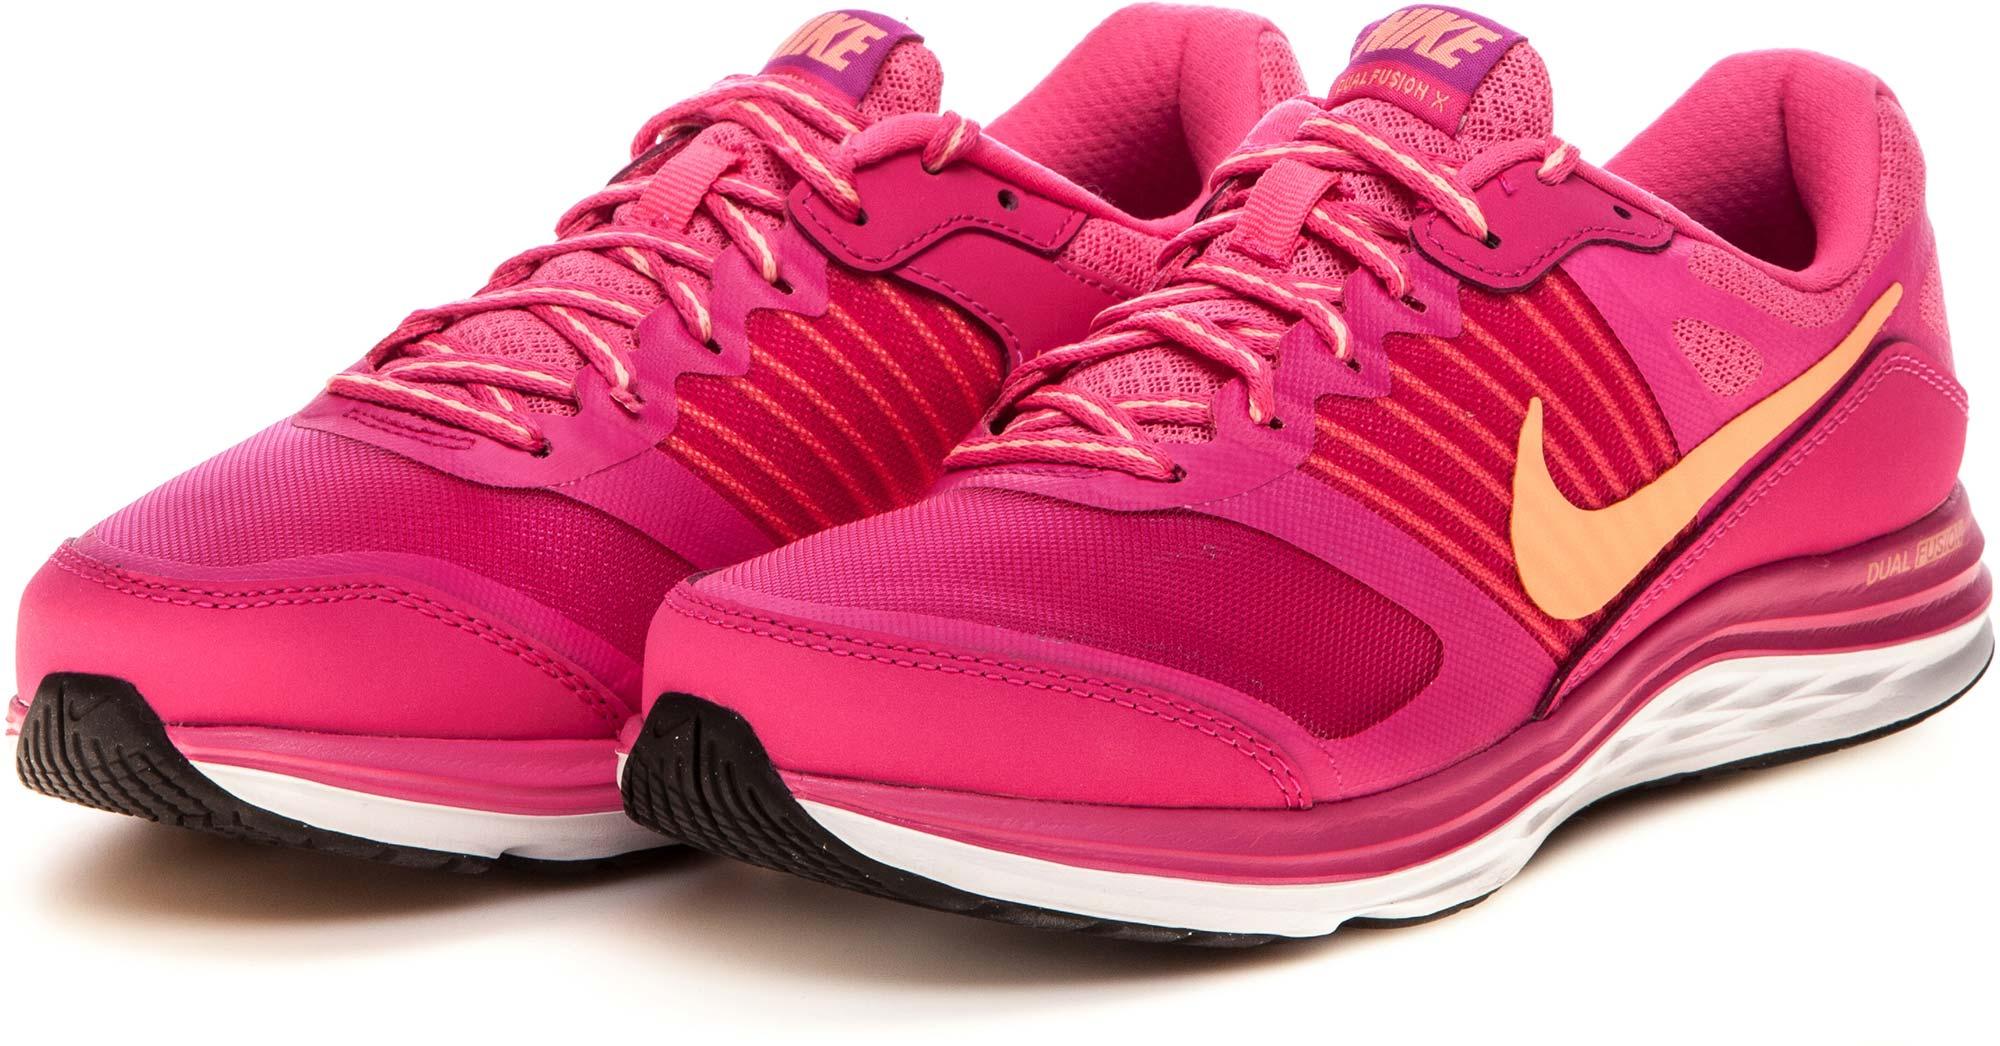 W Running Shoe